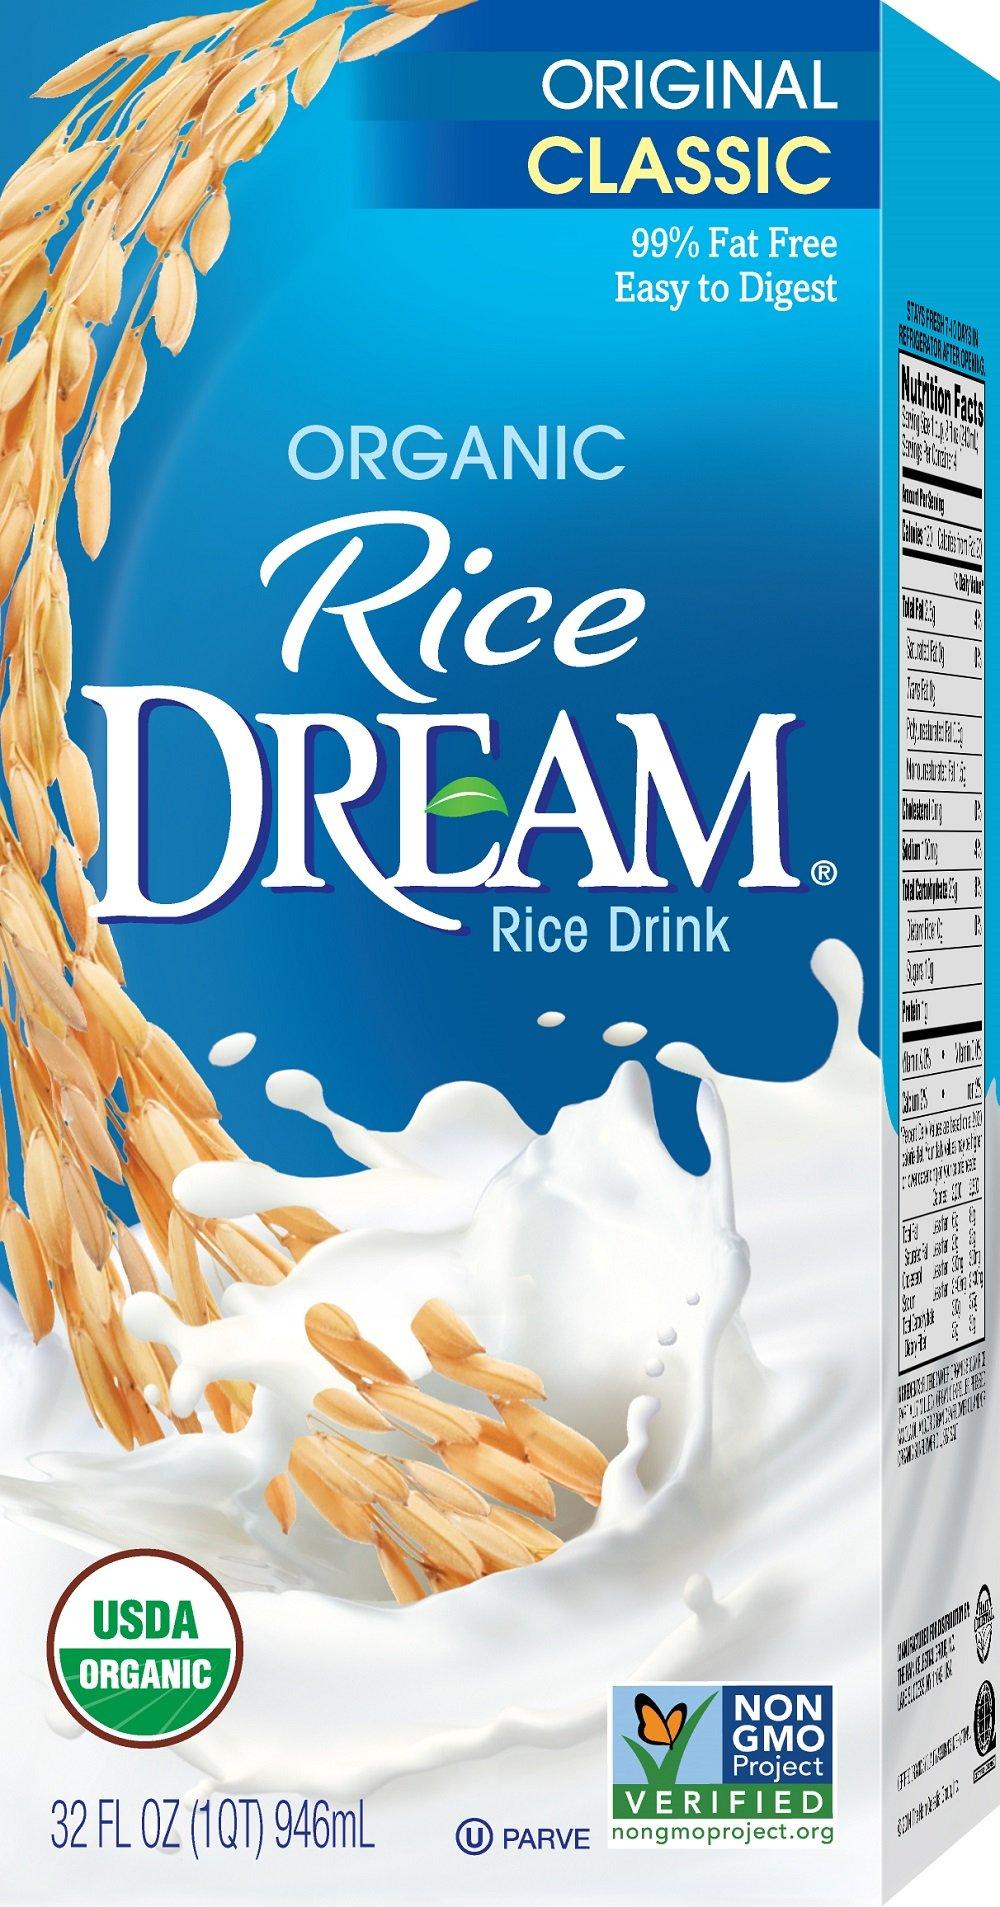 RICE DREAM Classic Original Organic Rice Drink, 32 fl. oz. (Pack of 12) by Dream Blends